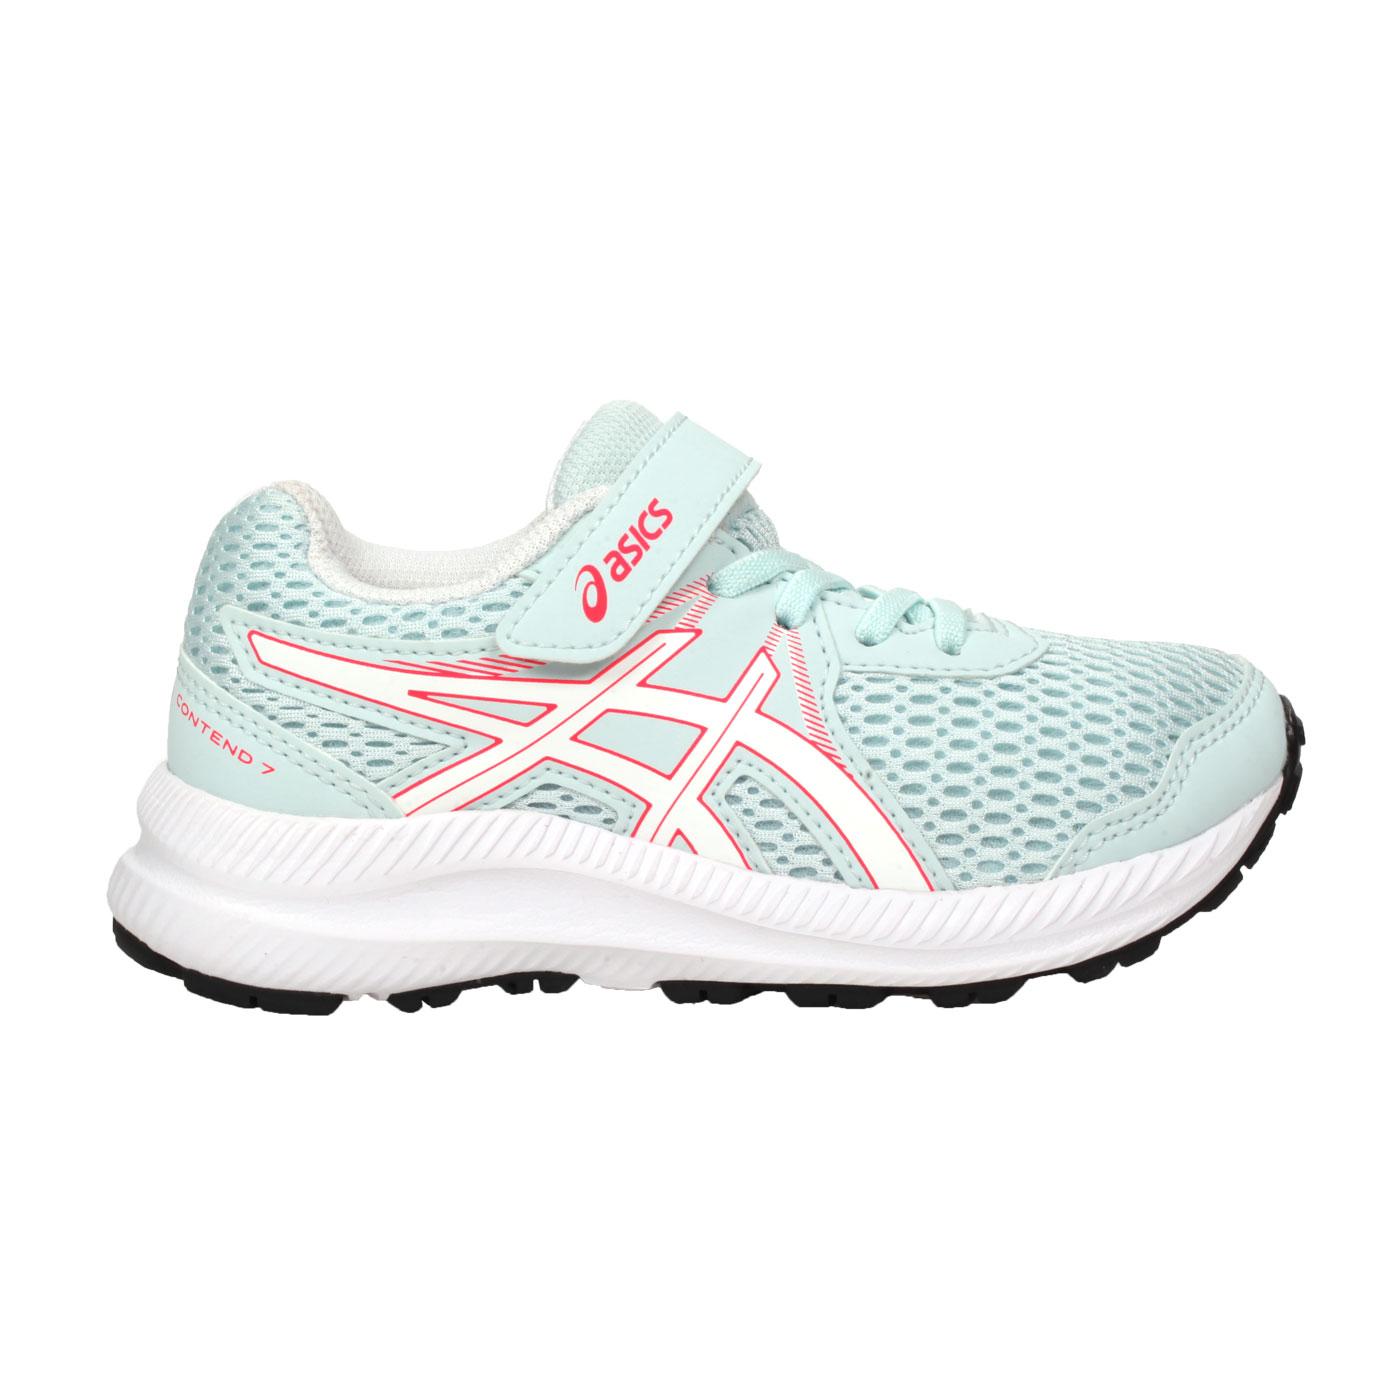 ASICS 中童慢跑鞋  @CONTEND 7 PS@1014A194-402 - 粉綠白紅